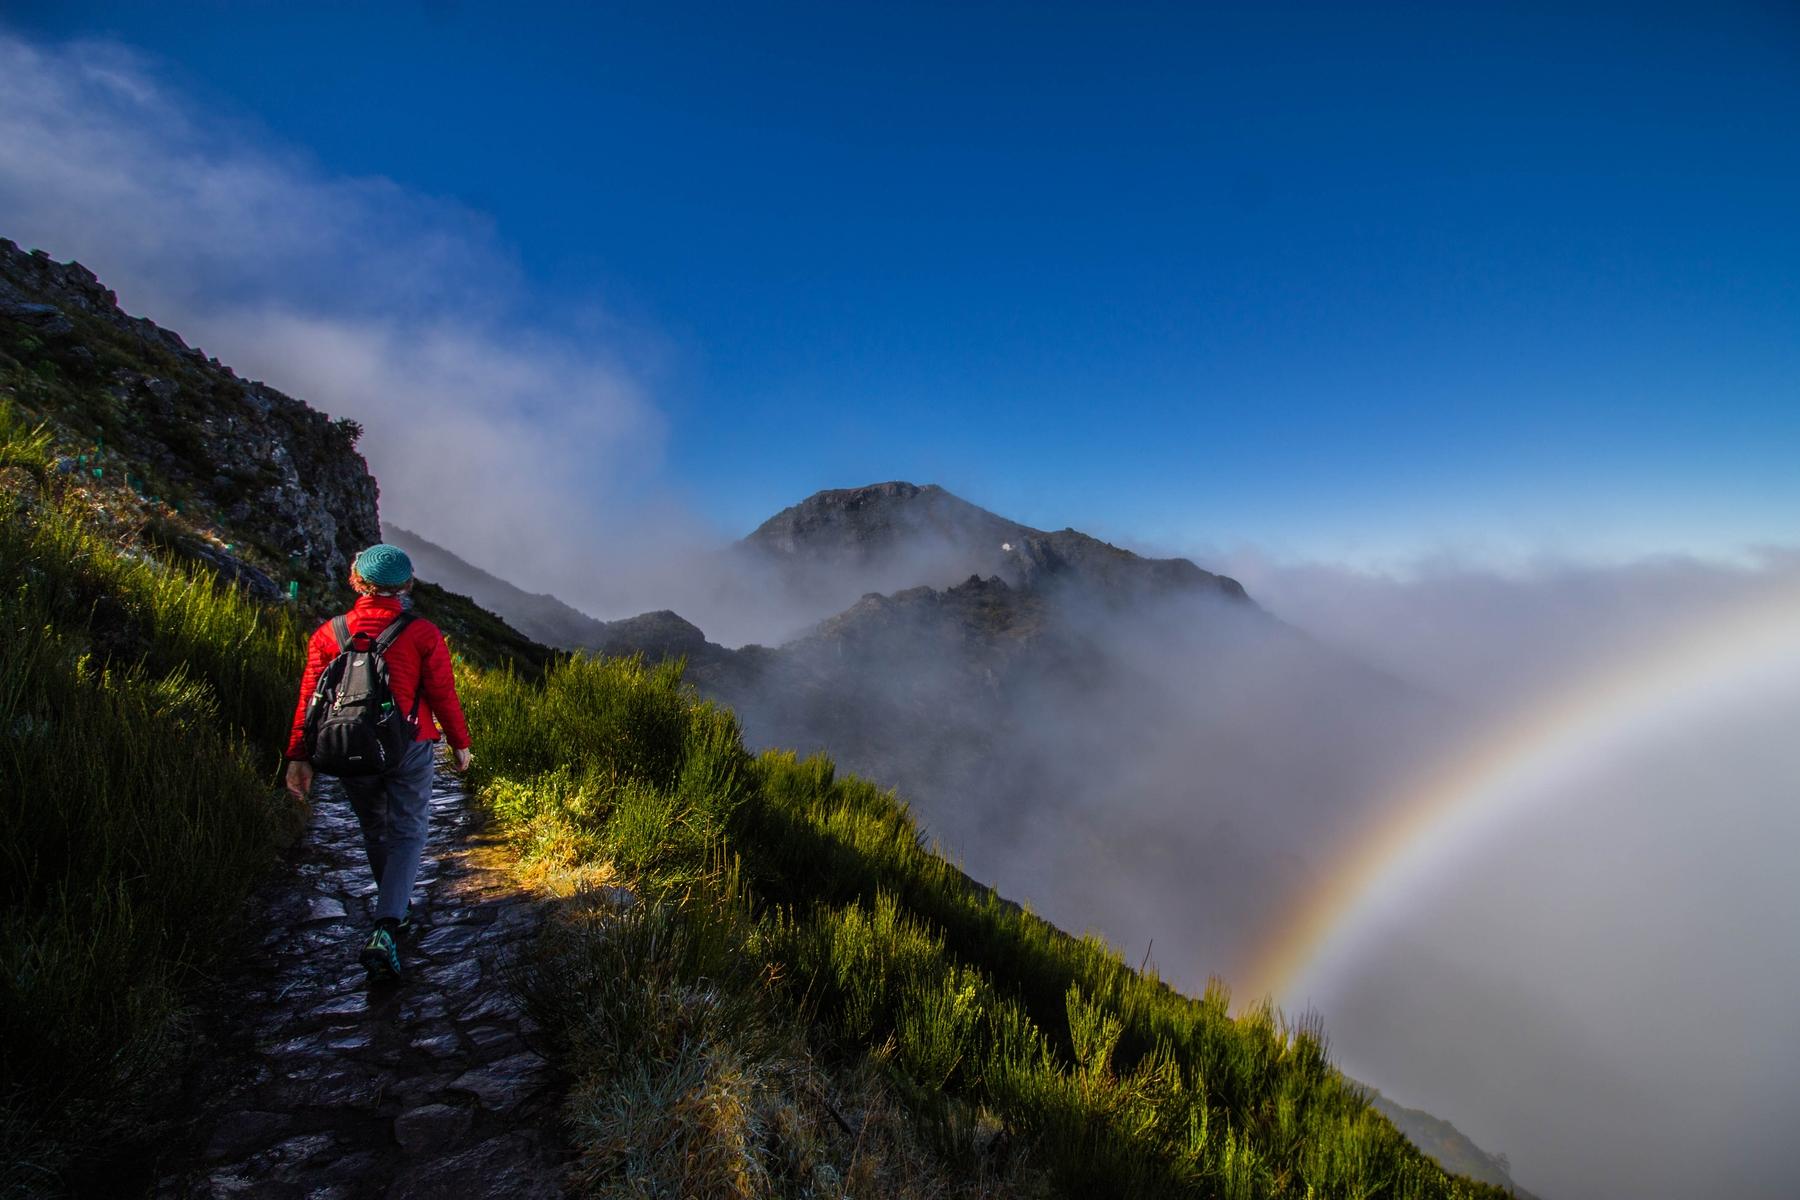 Rainbow above Pico Ruivo, Madeira